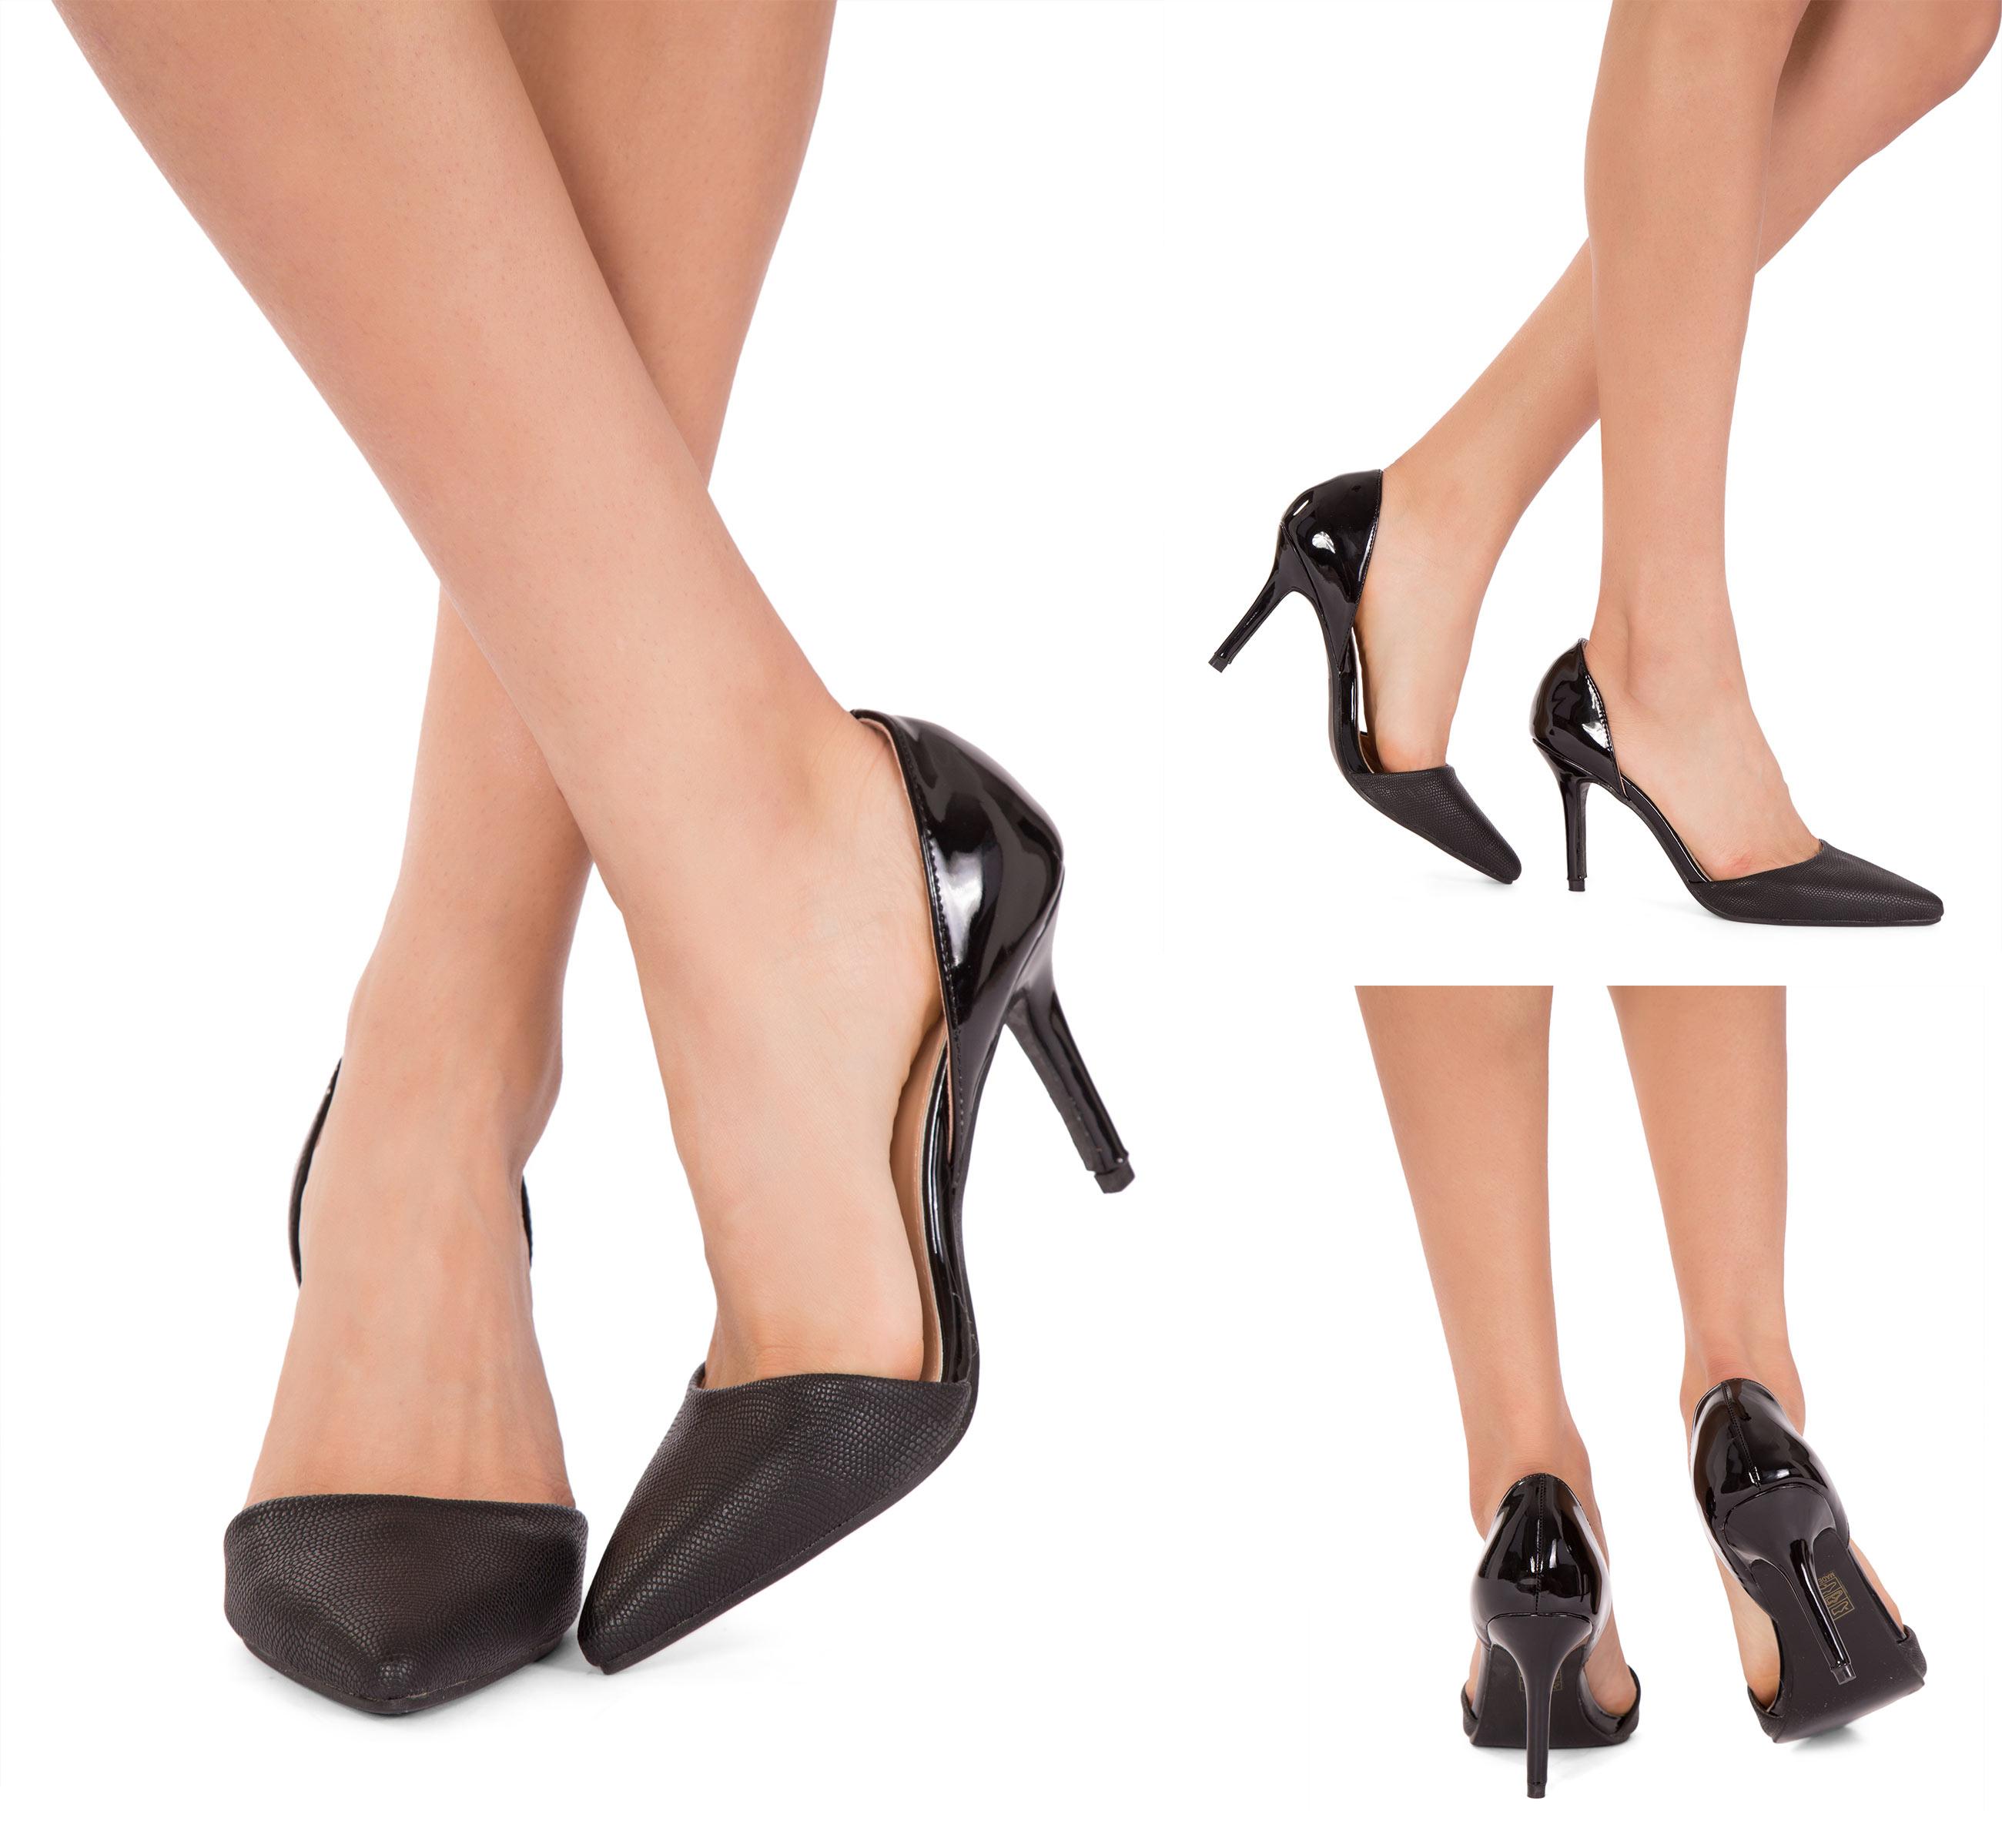 BRAND NEW LADIES WOMEN PEEP TOE PIN BUCKLE STILETTO FASHION SANDALS UK SIZE 3-8